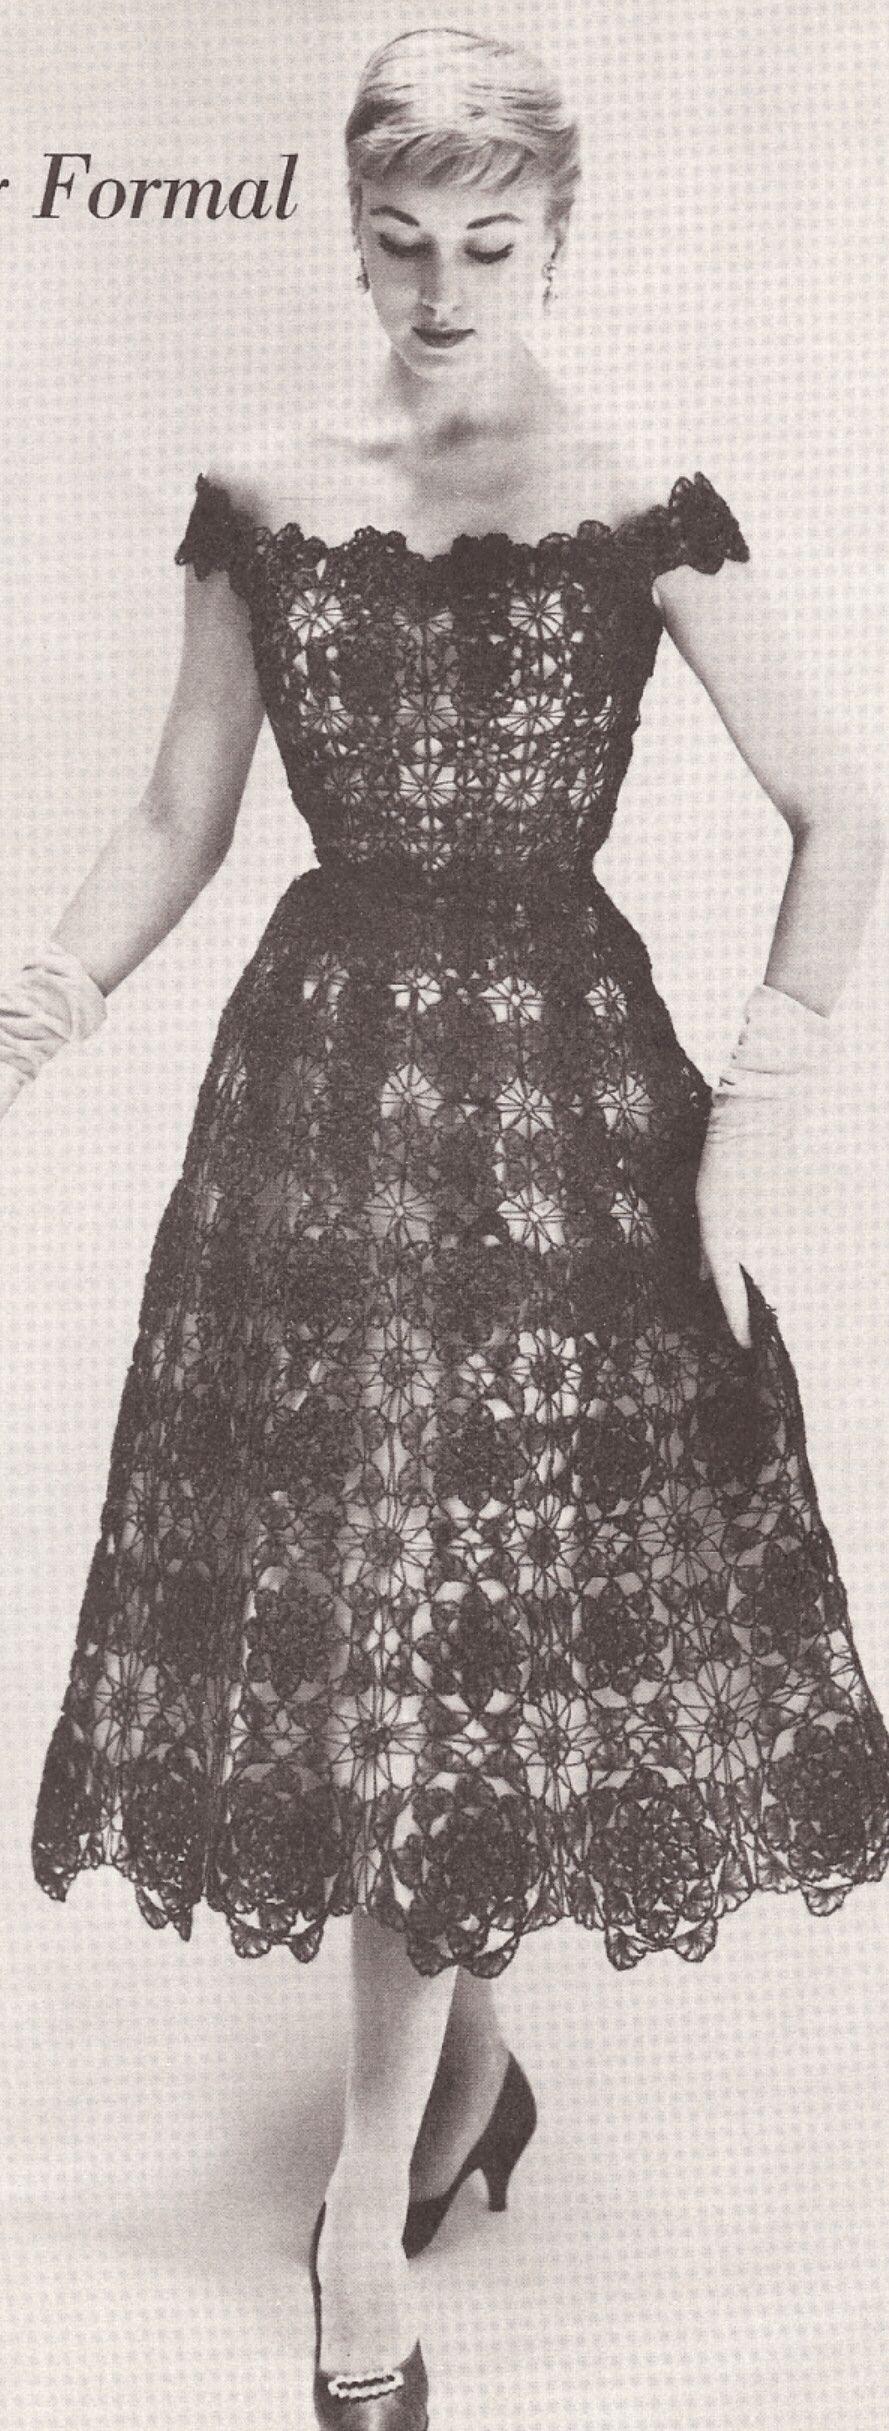 Lace dress 50s  Vintage Crochet PATTERN to make Lace Formal Evening Dress s